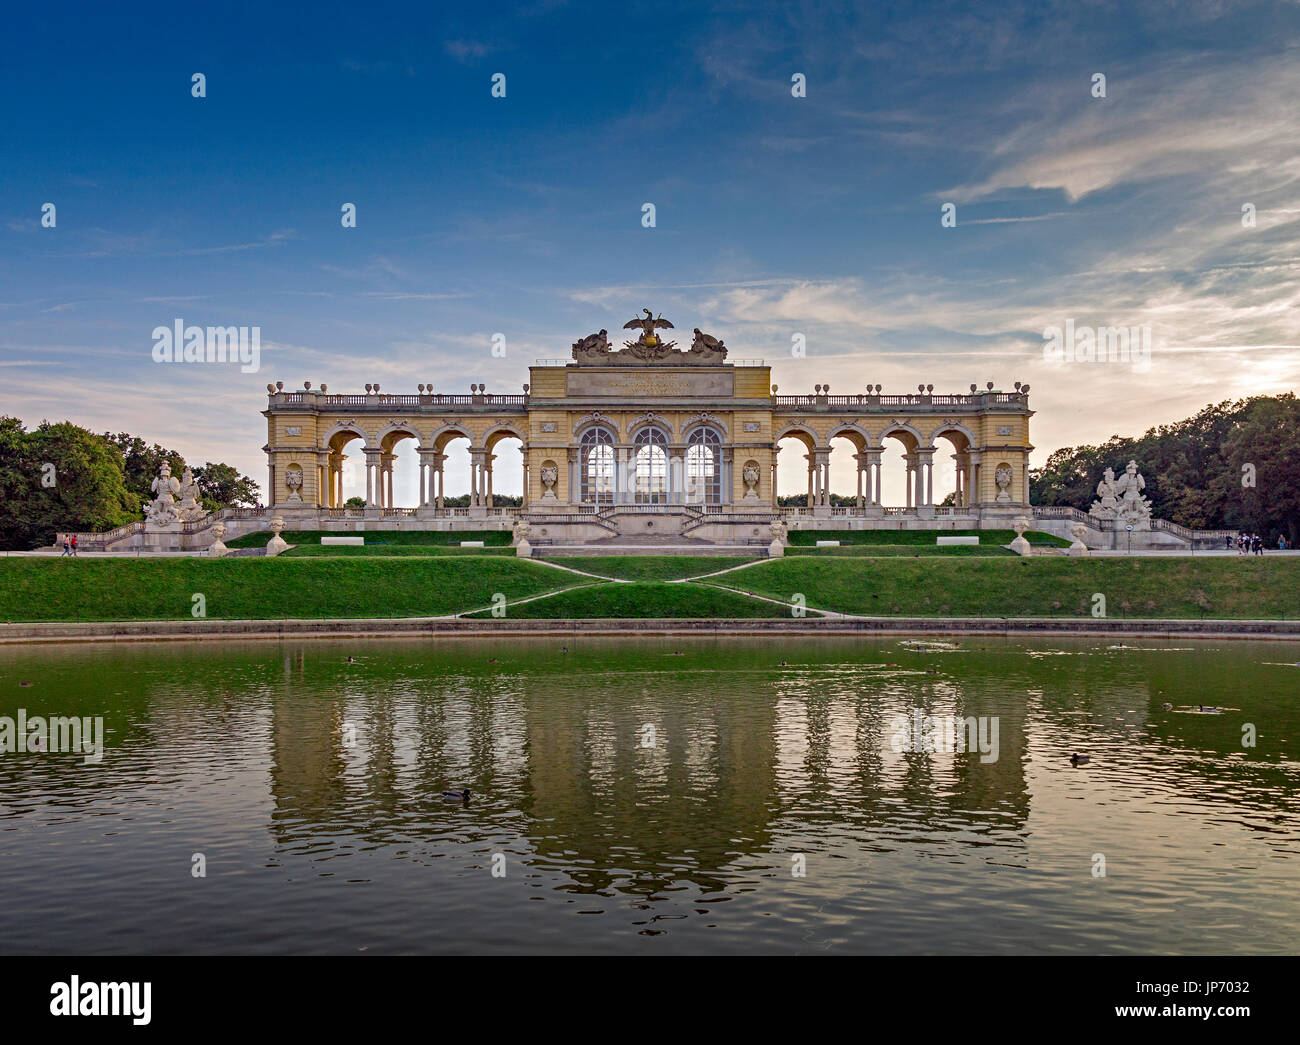 La Gloriette, al palacio de Schonbrunn, Viena, Austria Imagen De Stock